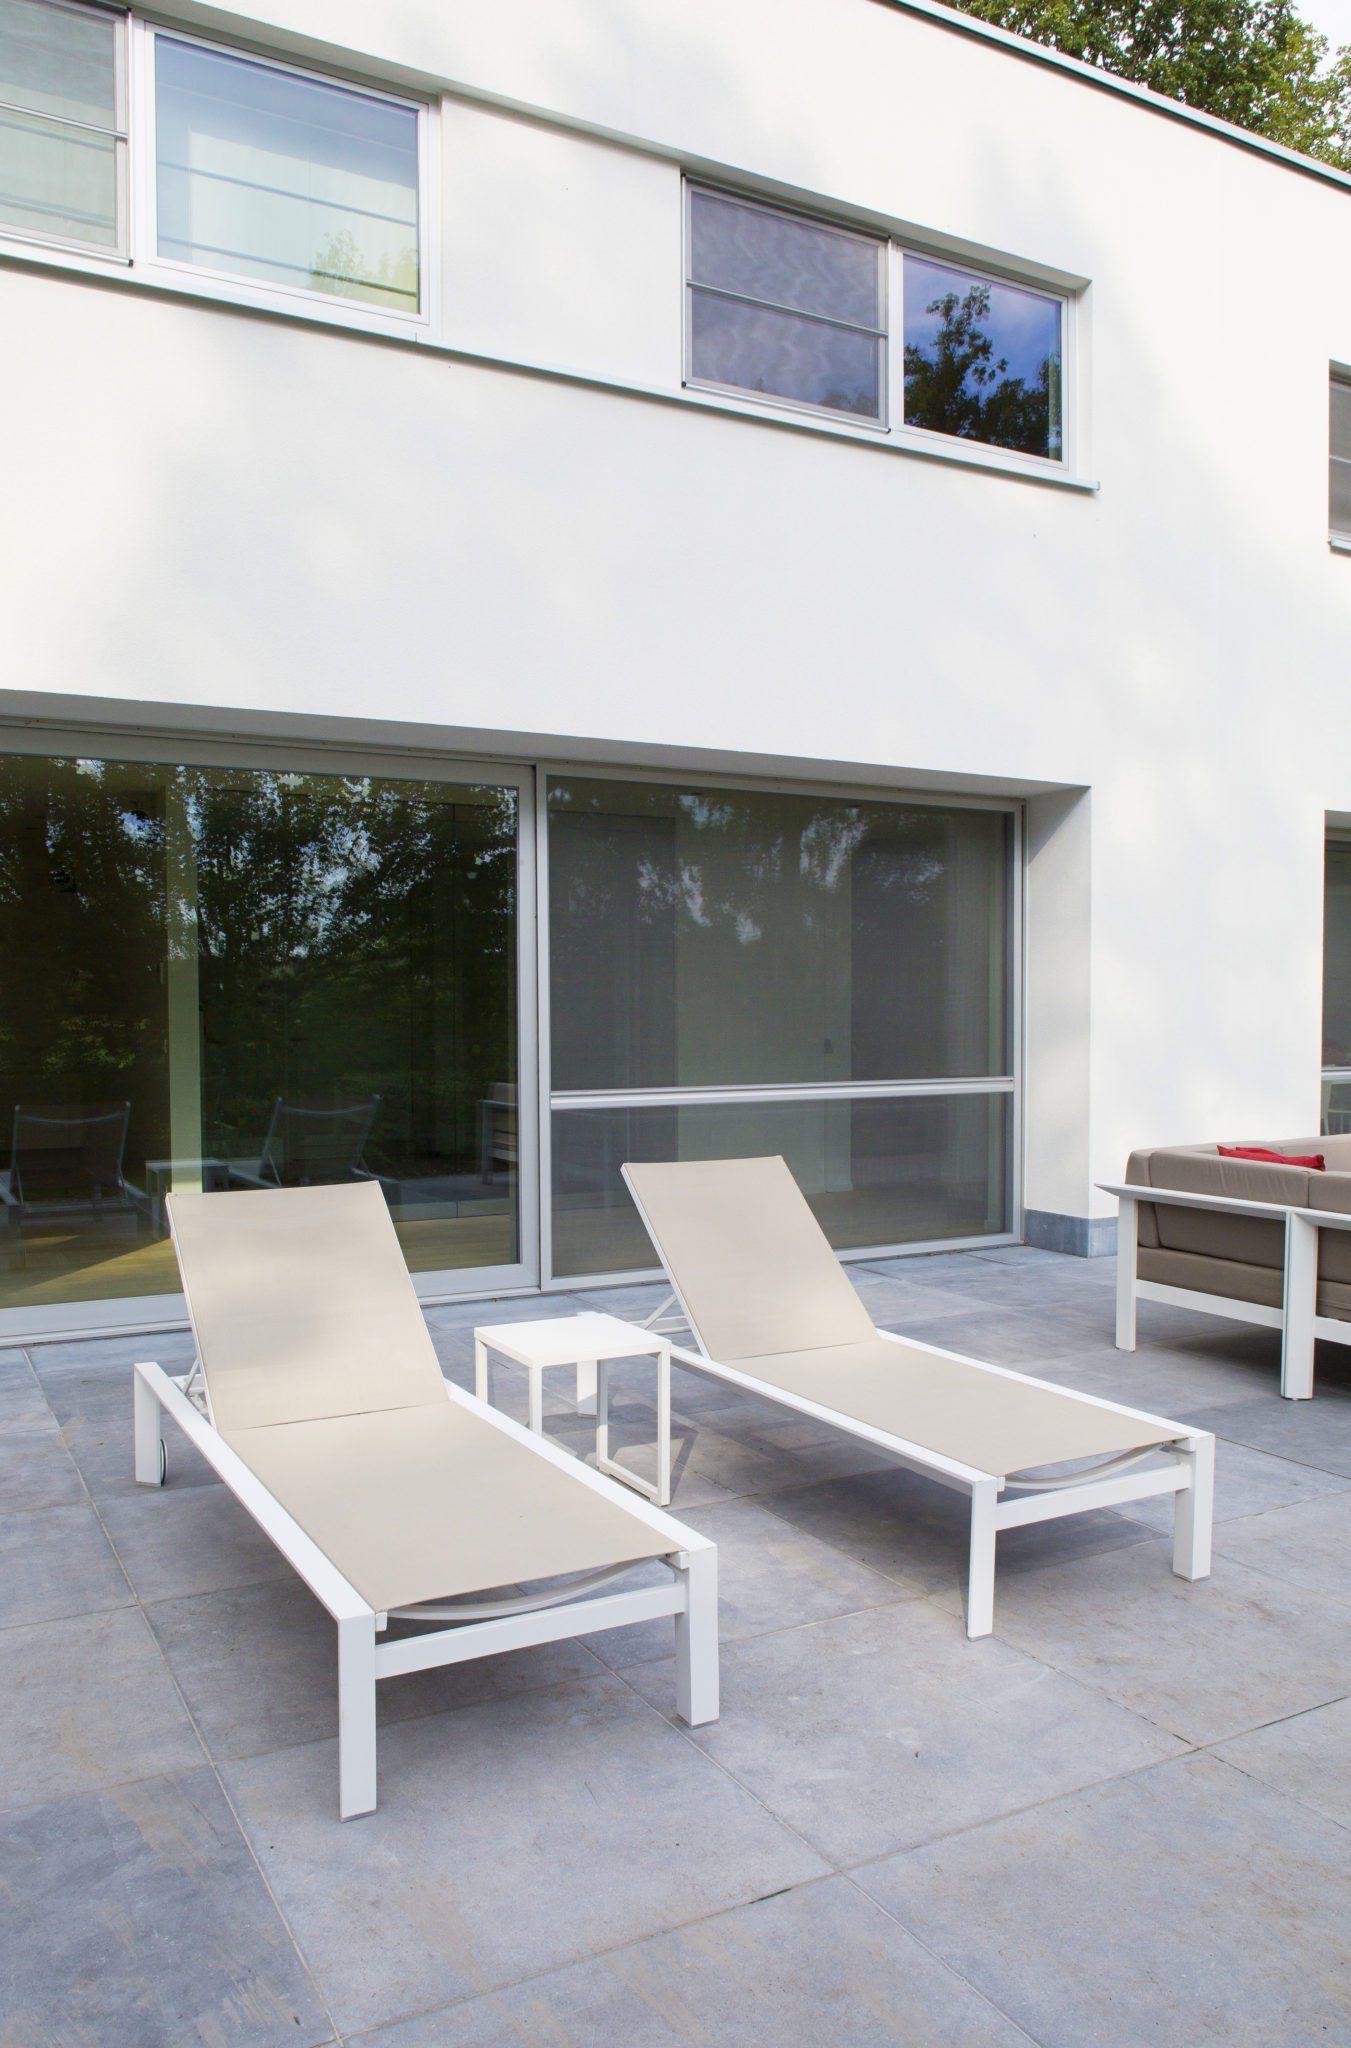 Aluminium Sun Lounger Outdoor Furniture Pool Patio Furniture